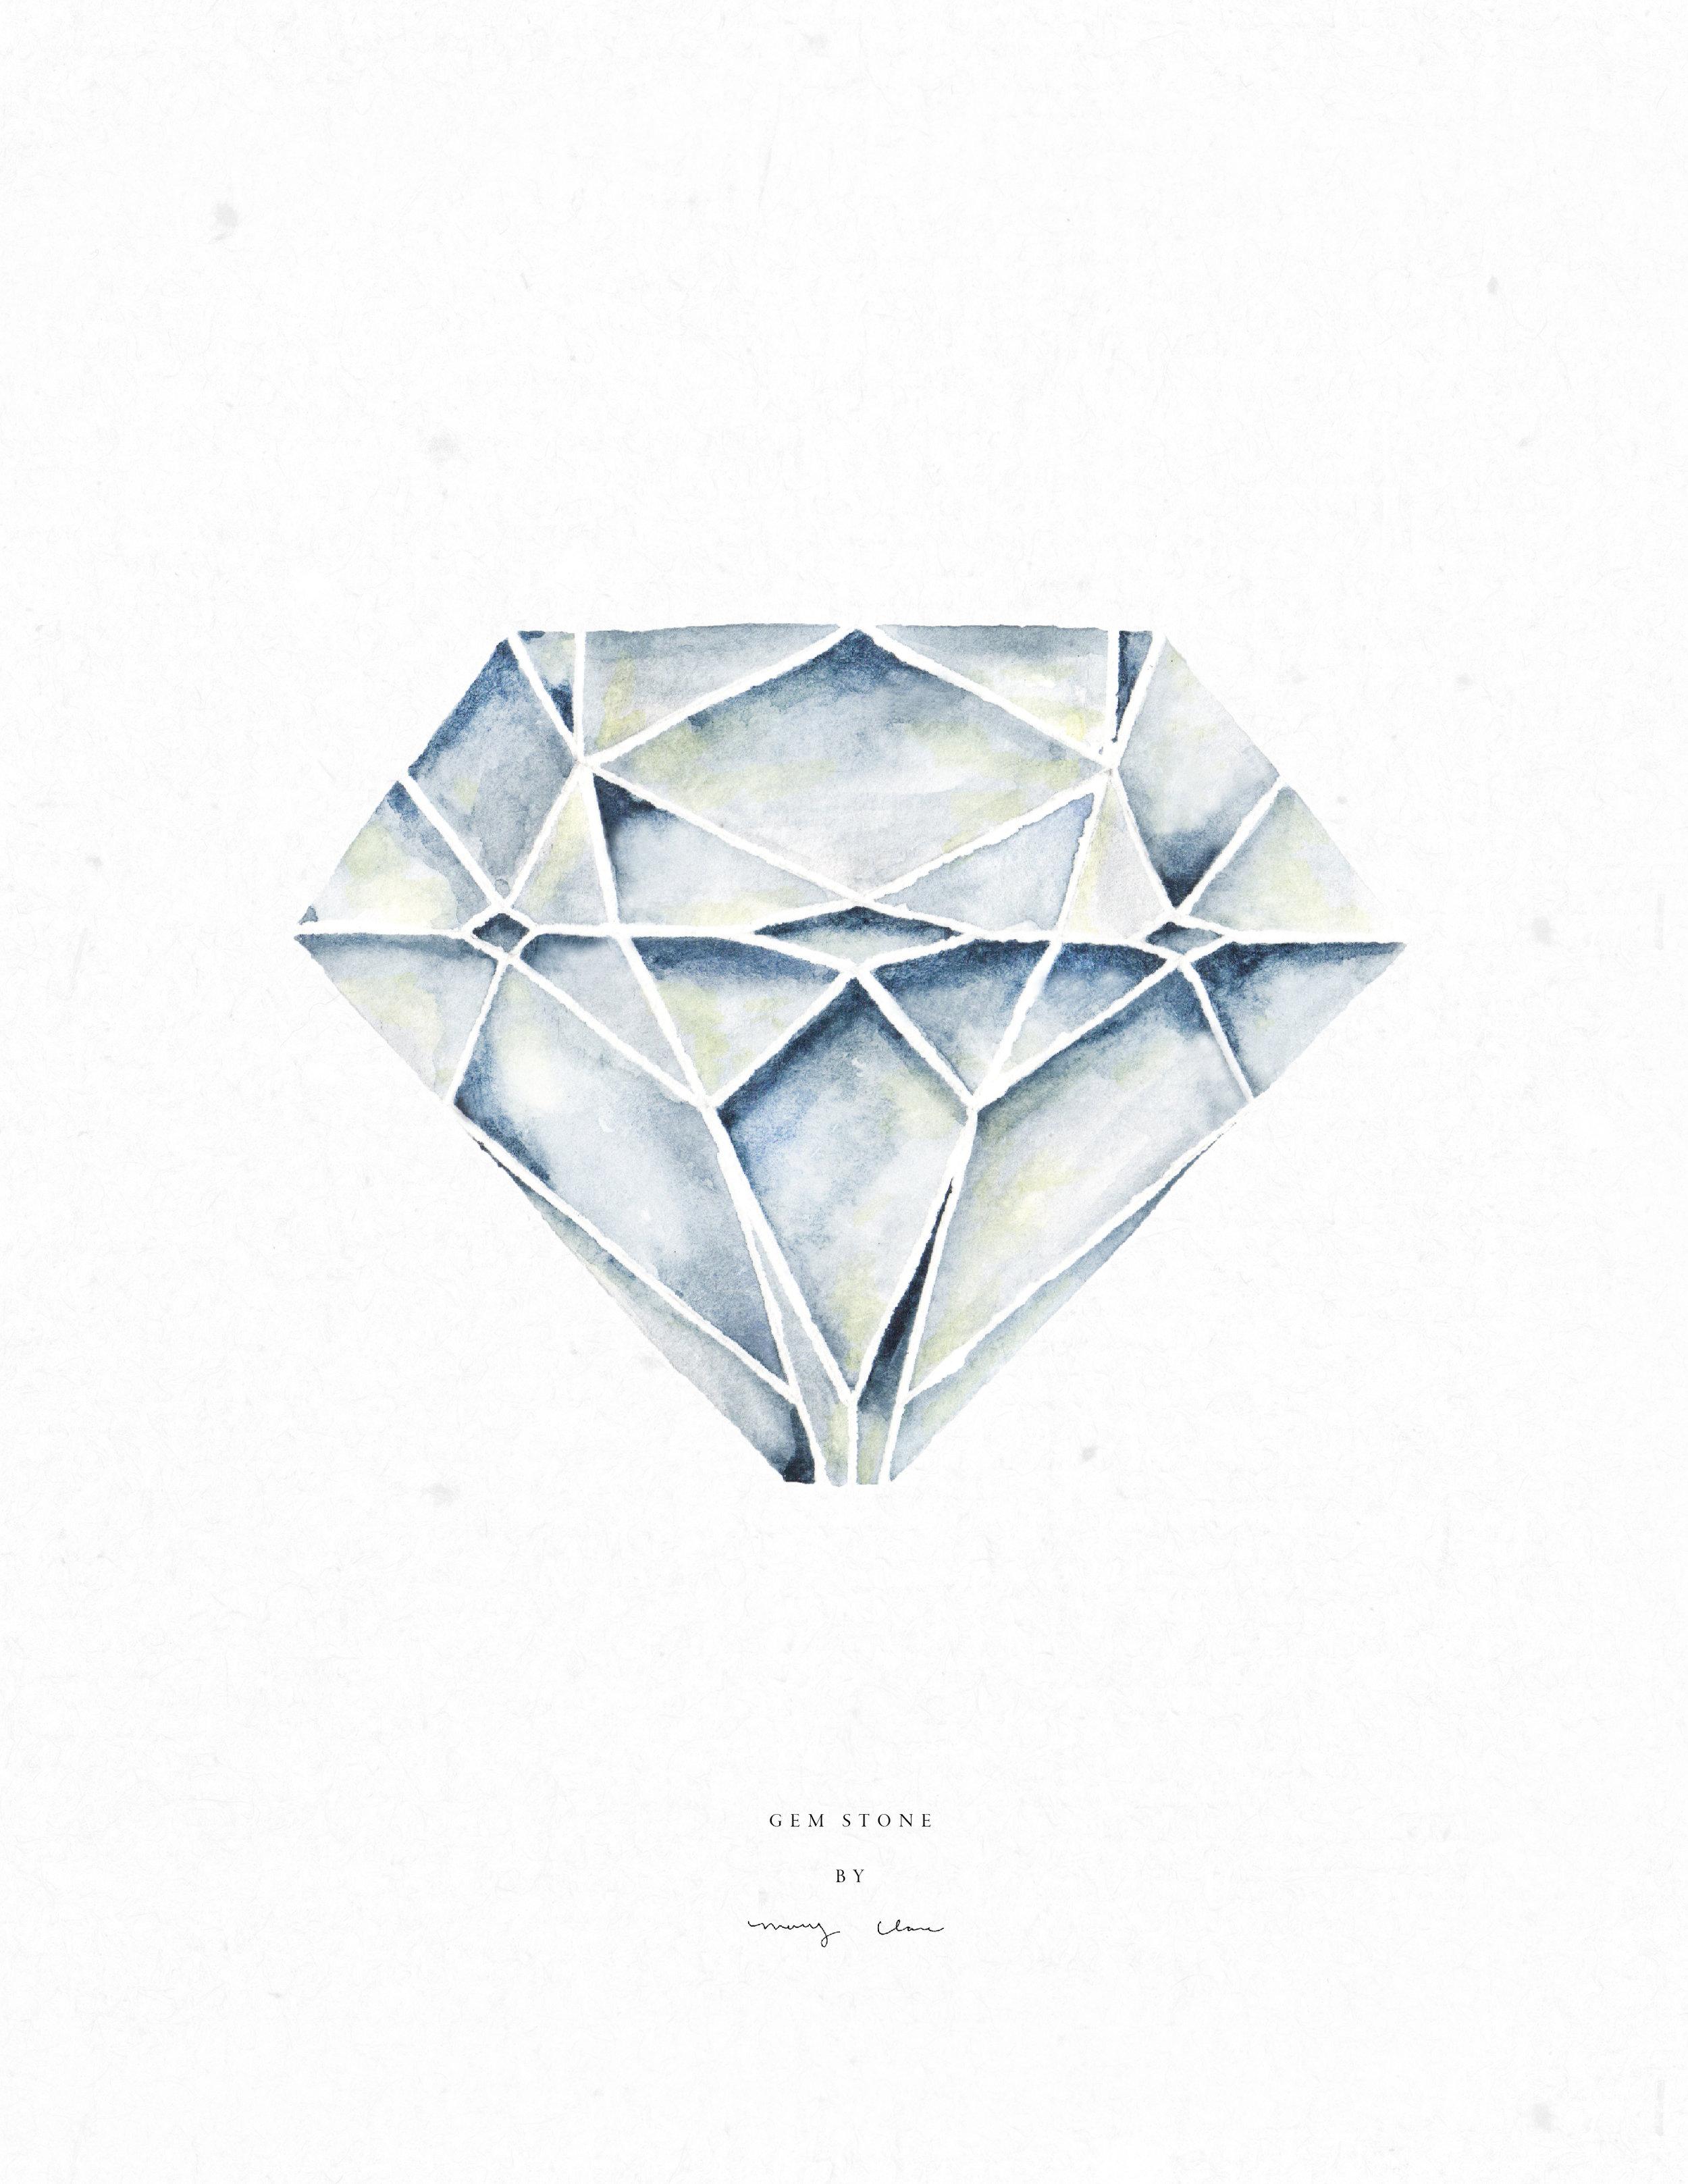 Gems-2-maryclarewilkie-Gem-stones-03-02.jpg